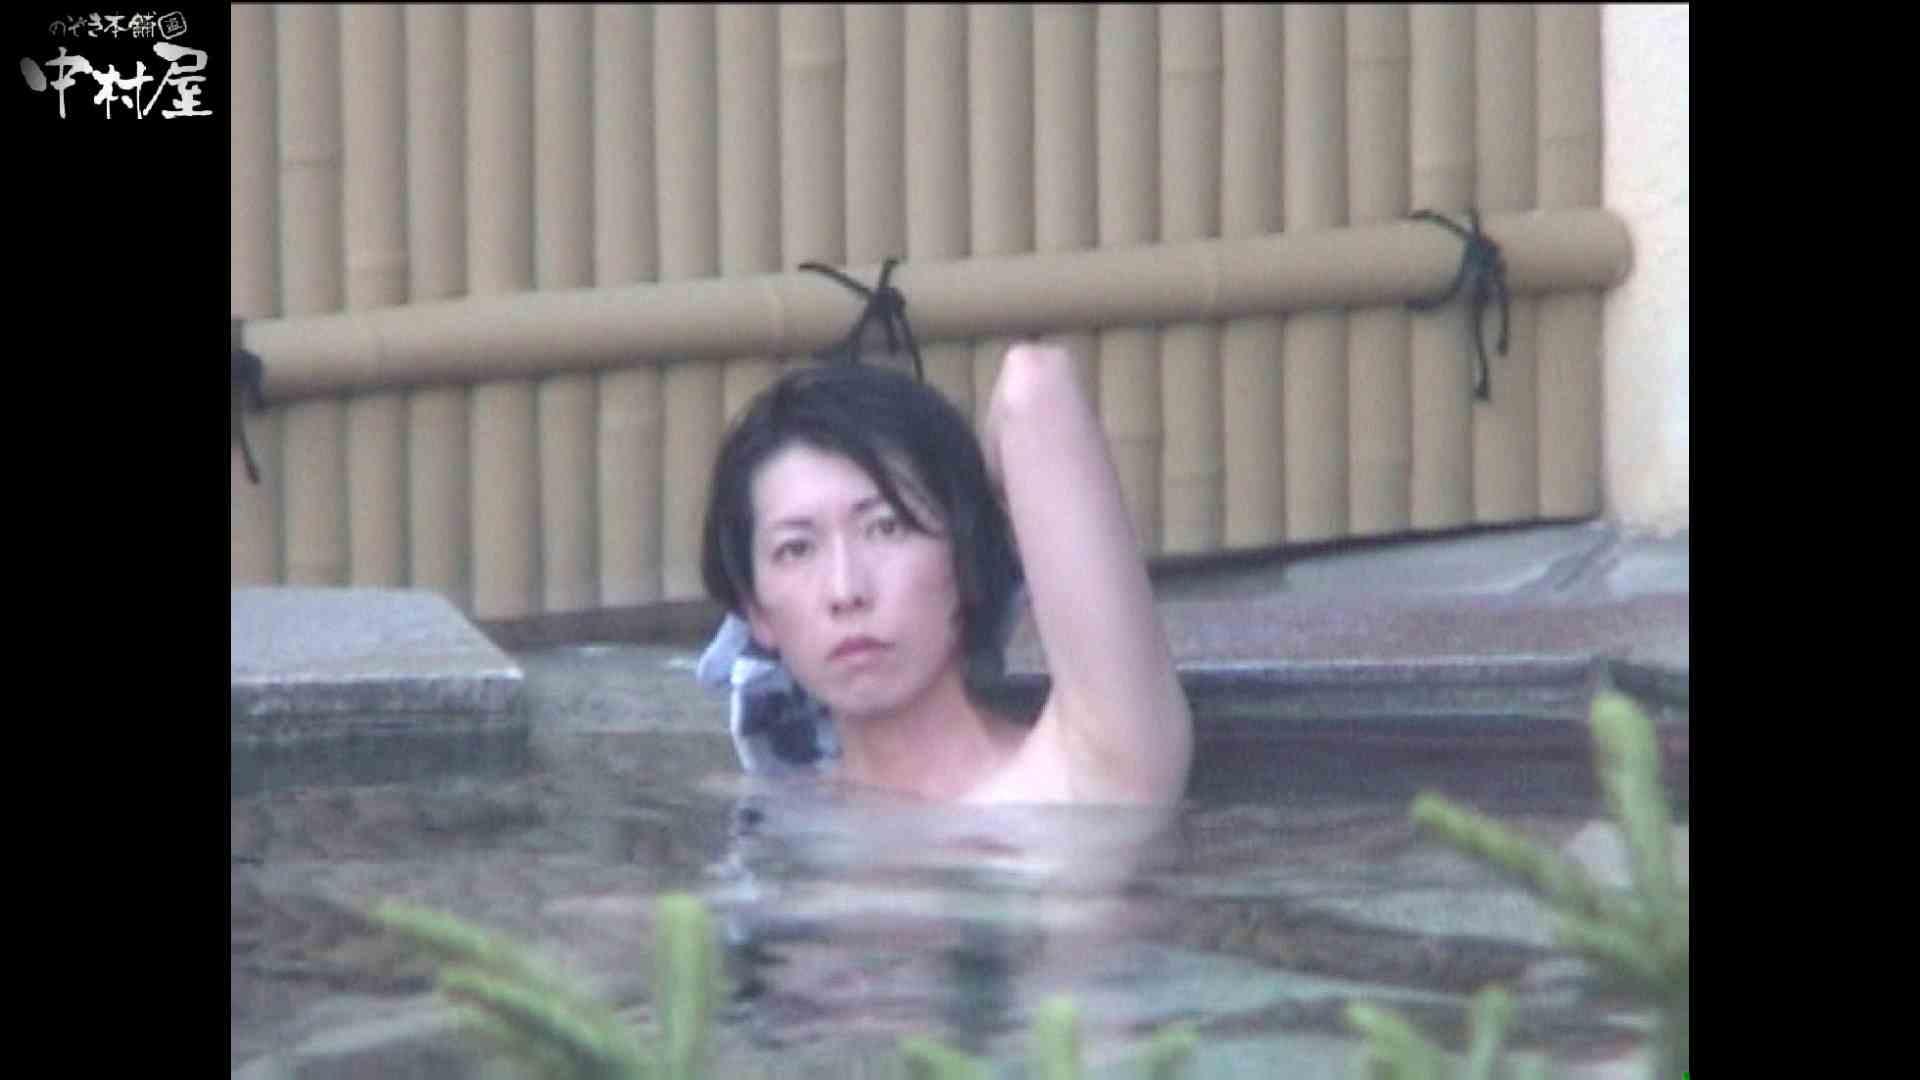 Aquaな露天風呂Vol.987 盗撮シリーズ | 露天風呂編  88PIX 13